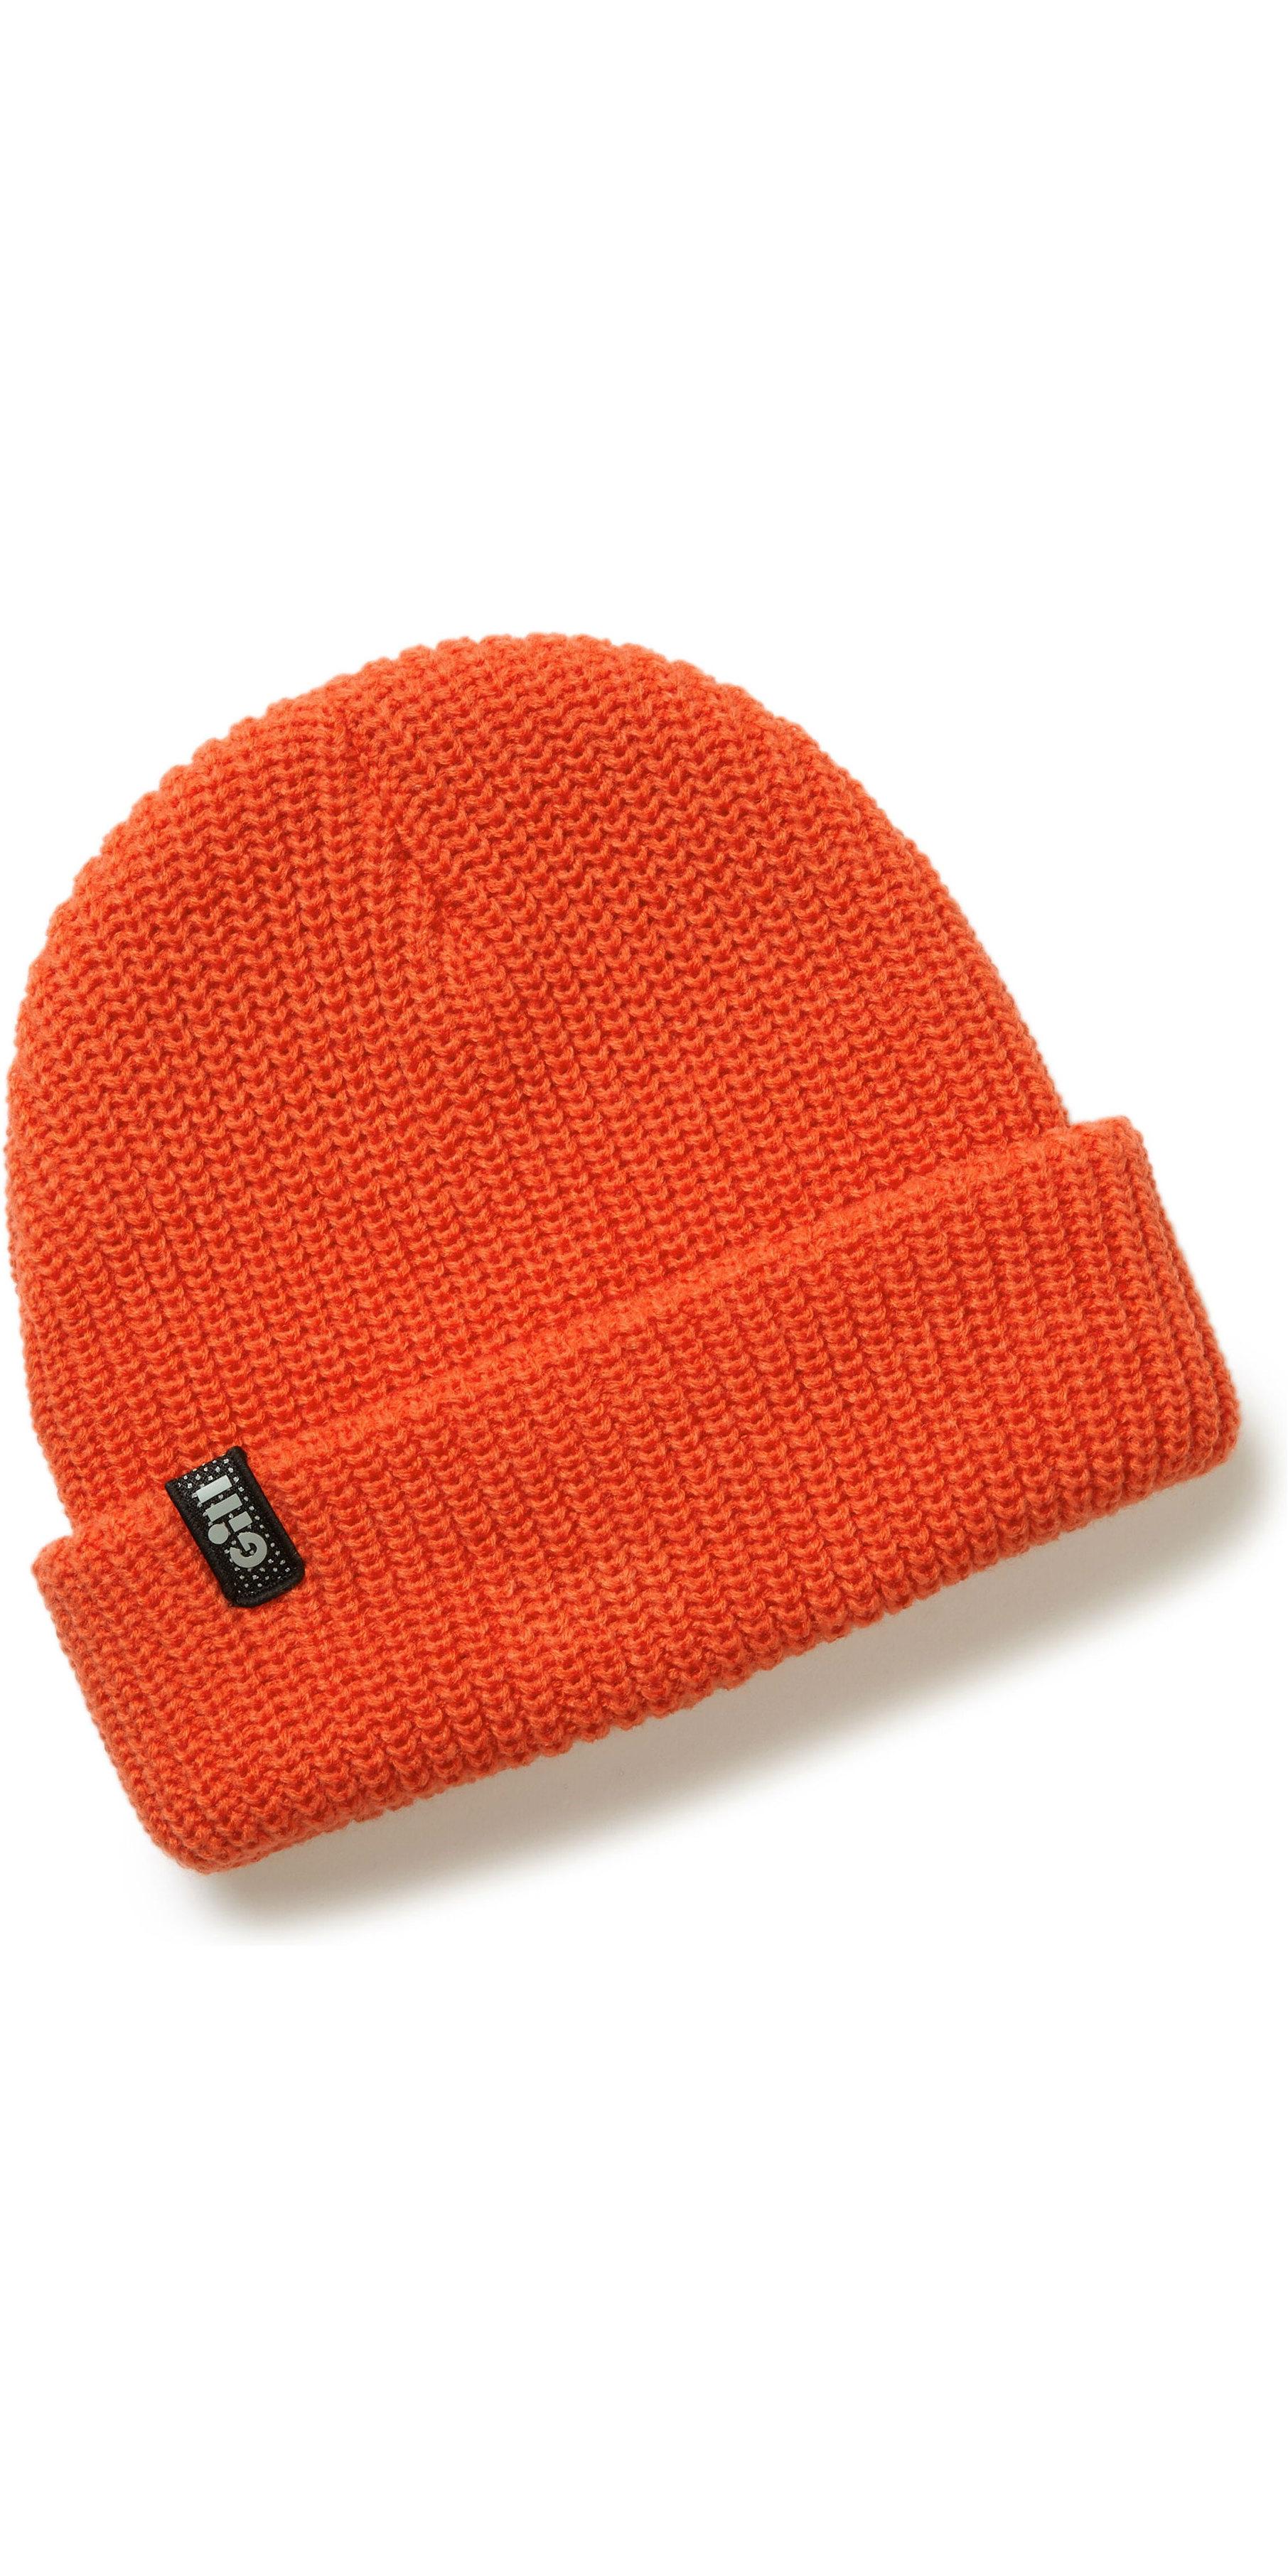 2019 Gill Floating Knit Beanie Orange HT37